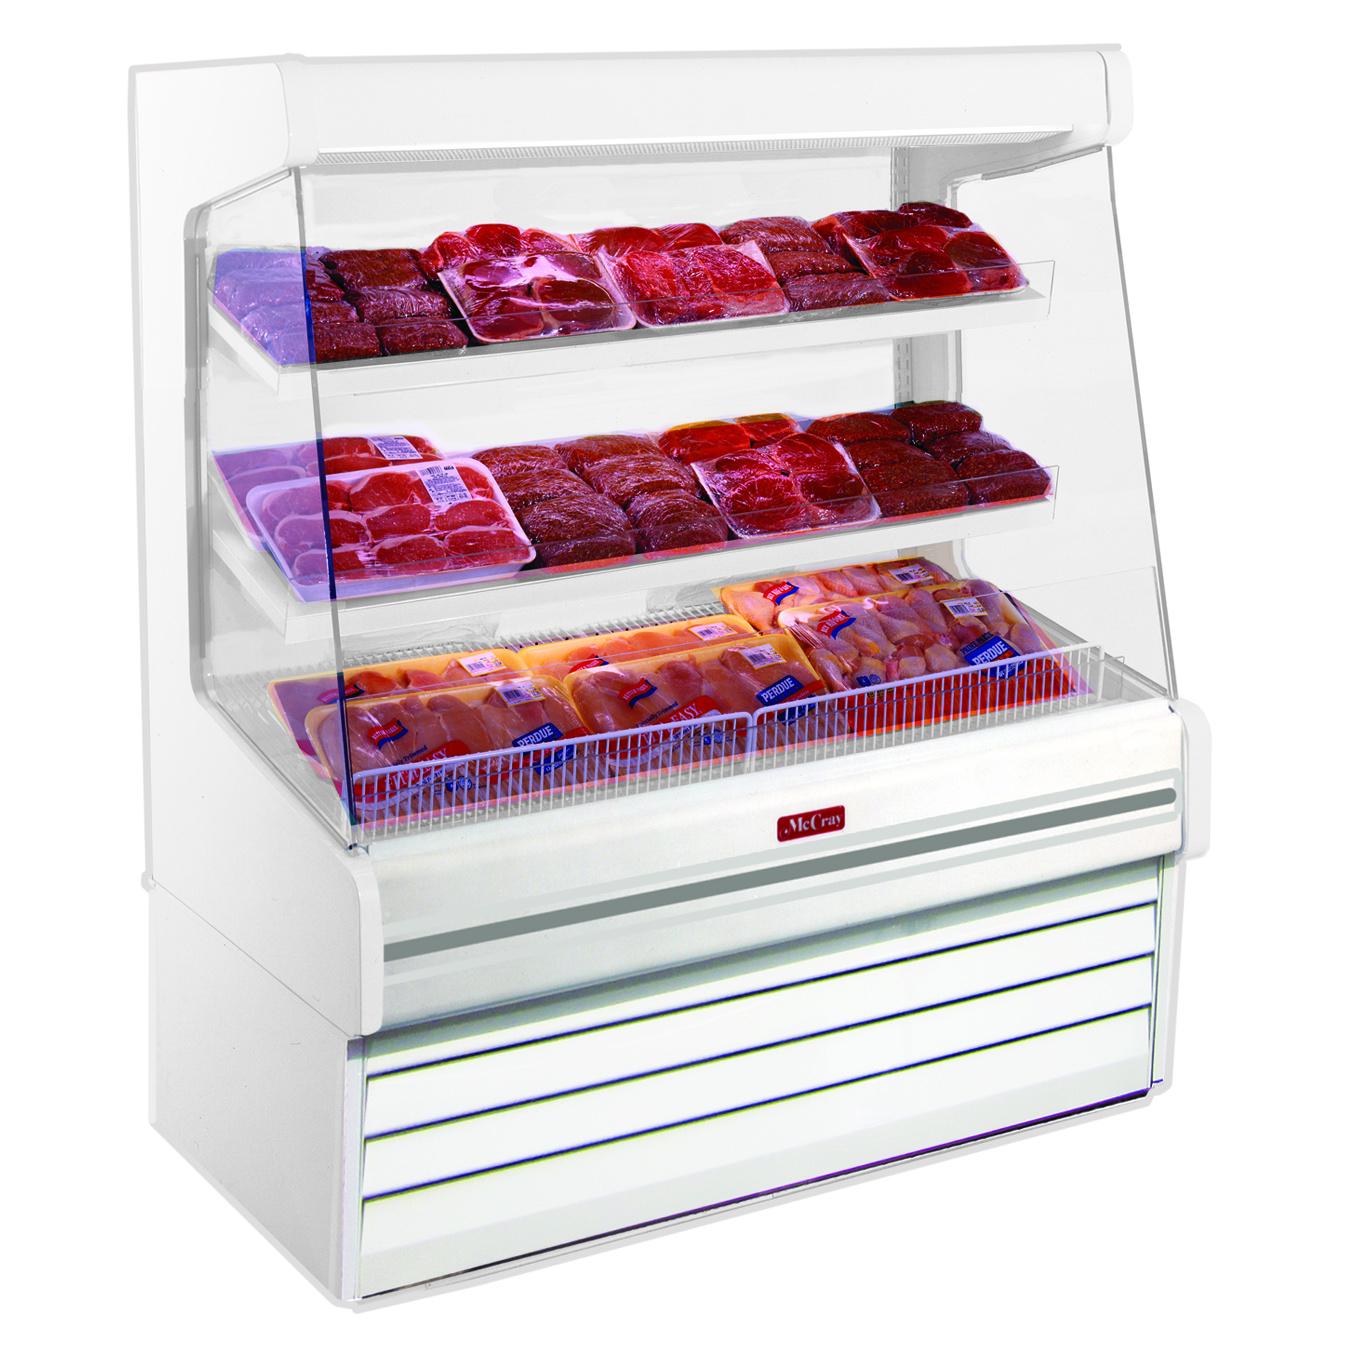 Howard-McCray SC-OP30E-3L-LED display case, produce